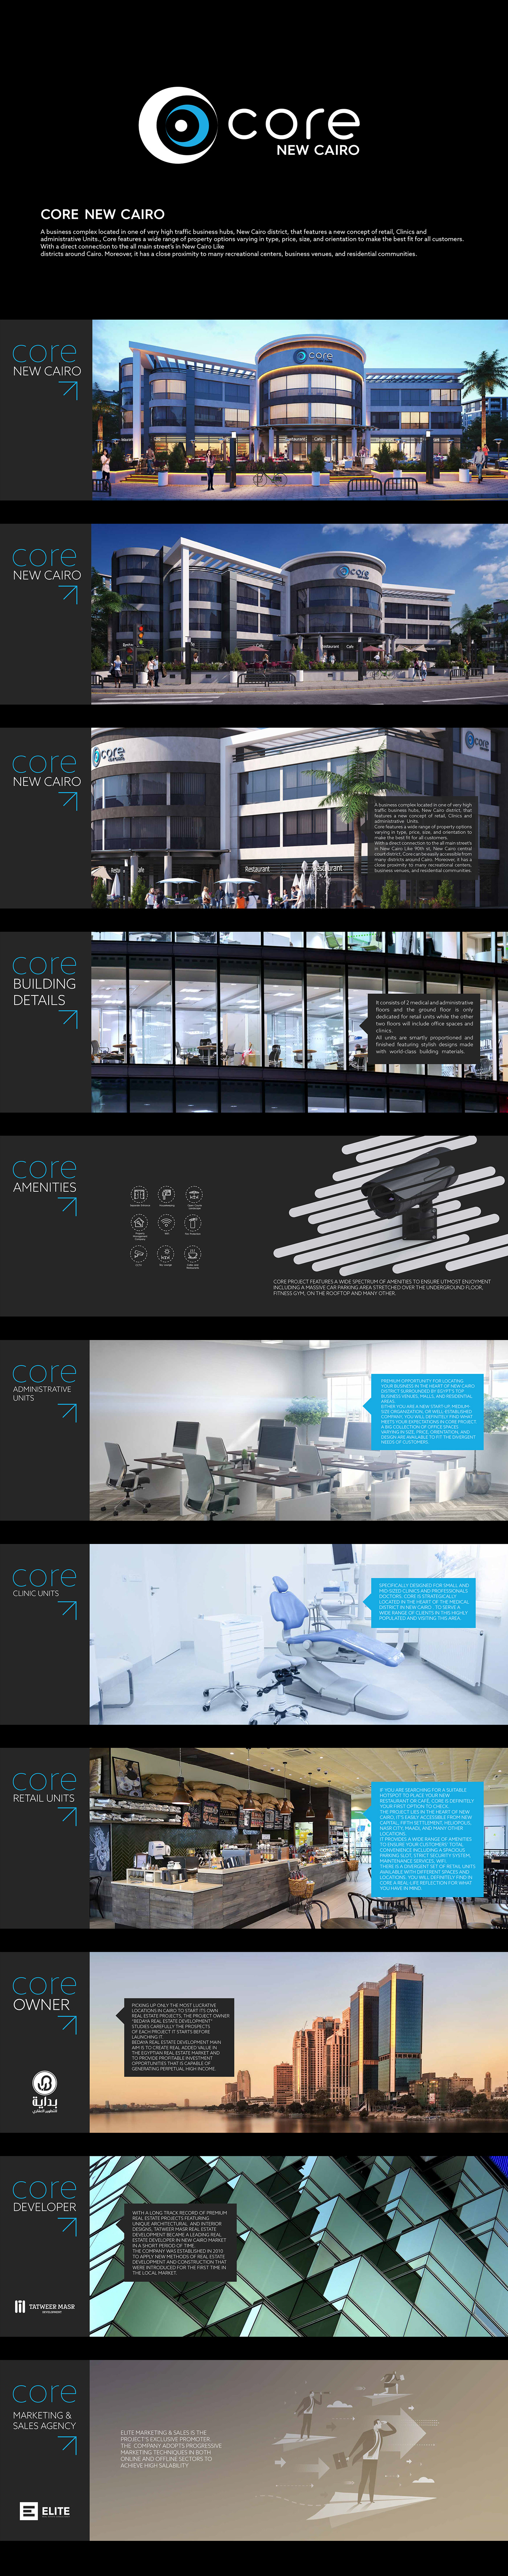 saeed elgarf design logo identity Shopping mall core sign design Logotype center